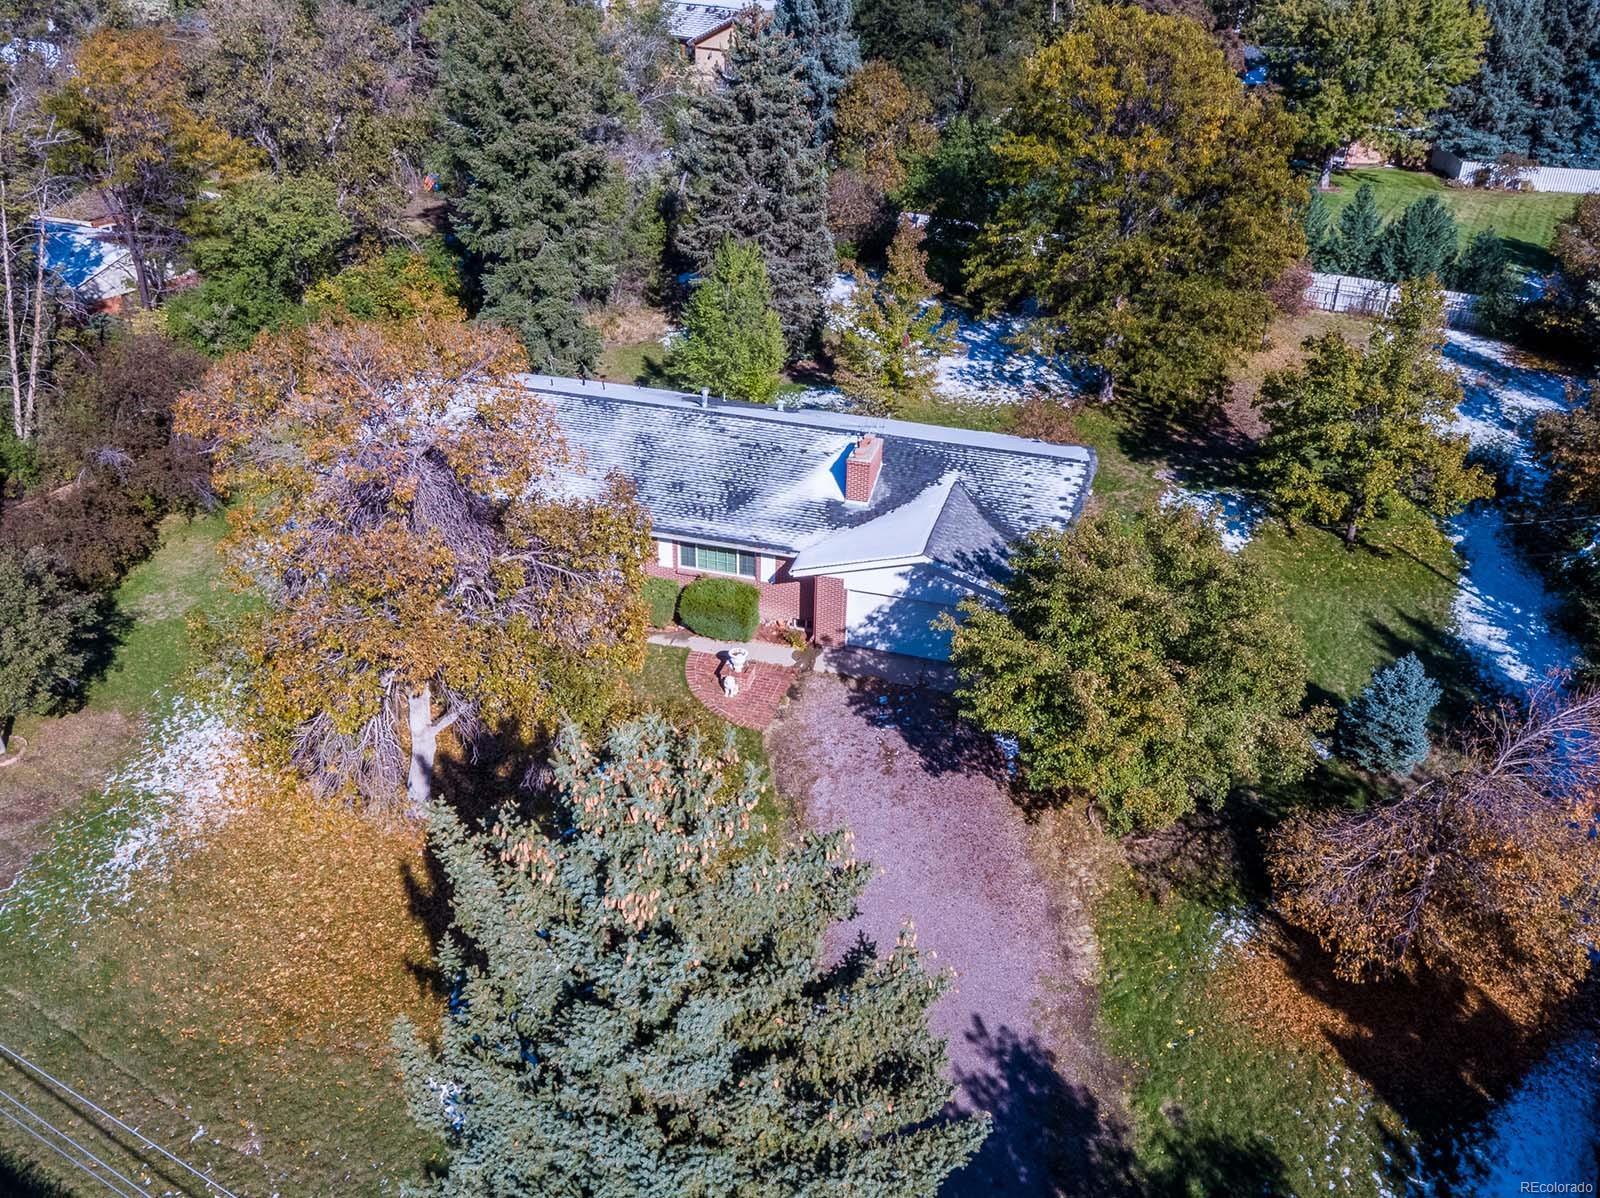 4930 Clarkson Street, Cherry Hills Village, CO 80113 - Cherry Hills Village, CO real estate listing